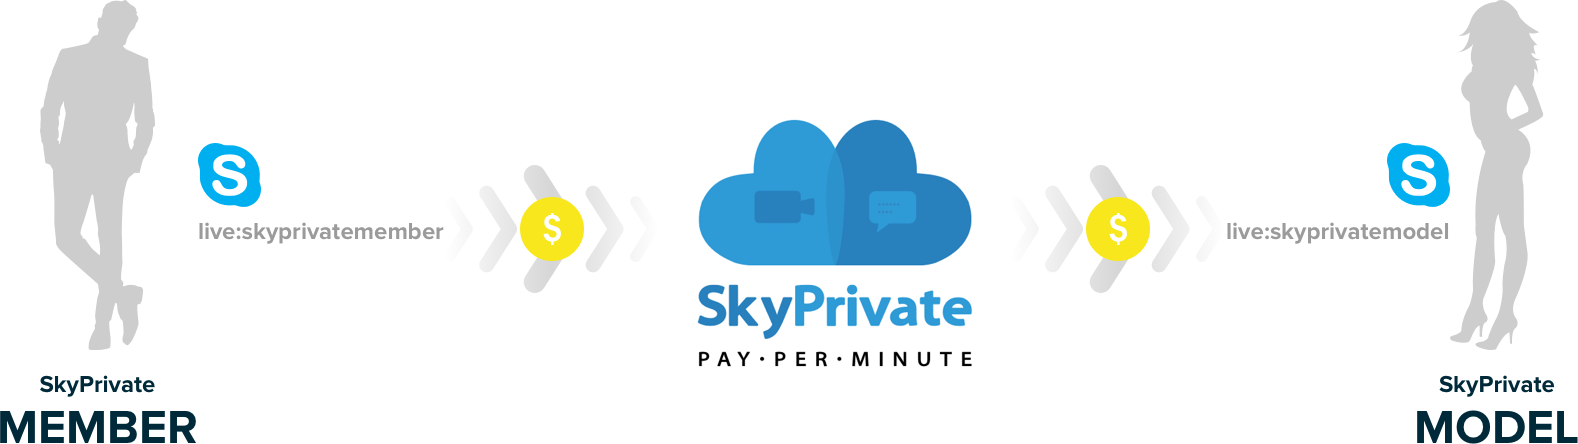 skyprivate skype pay per minute money transfer from member to model